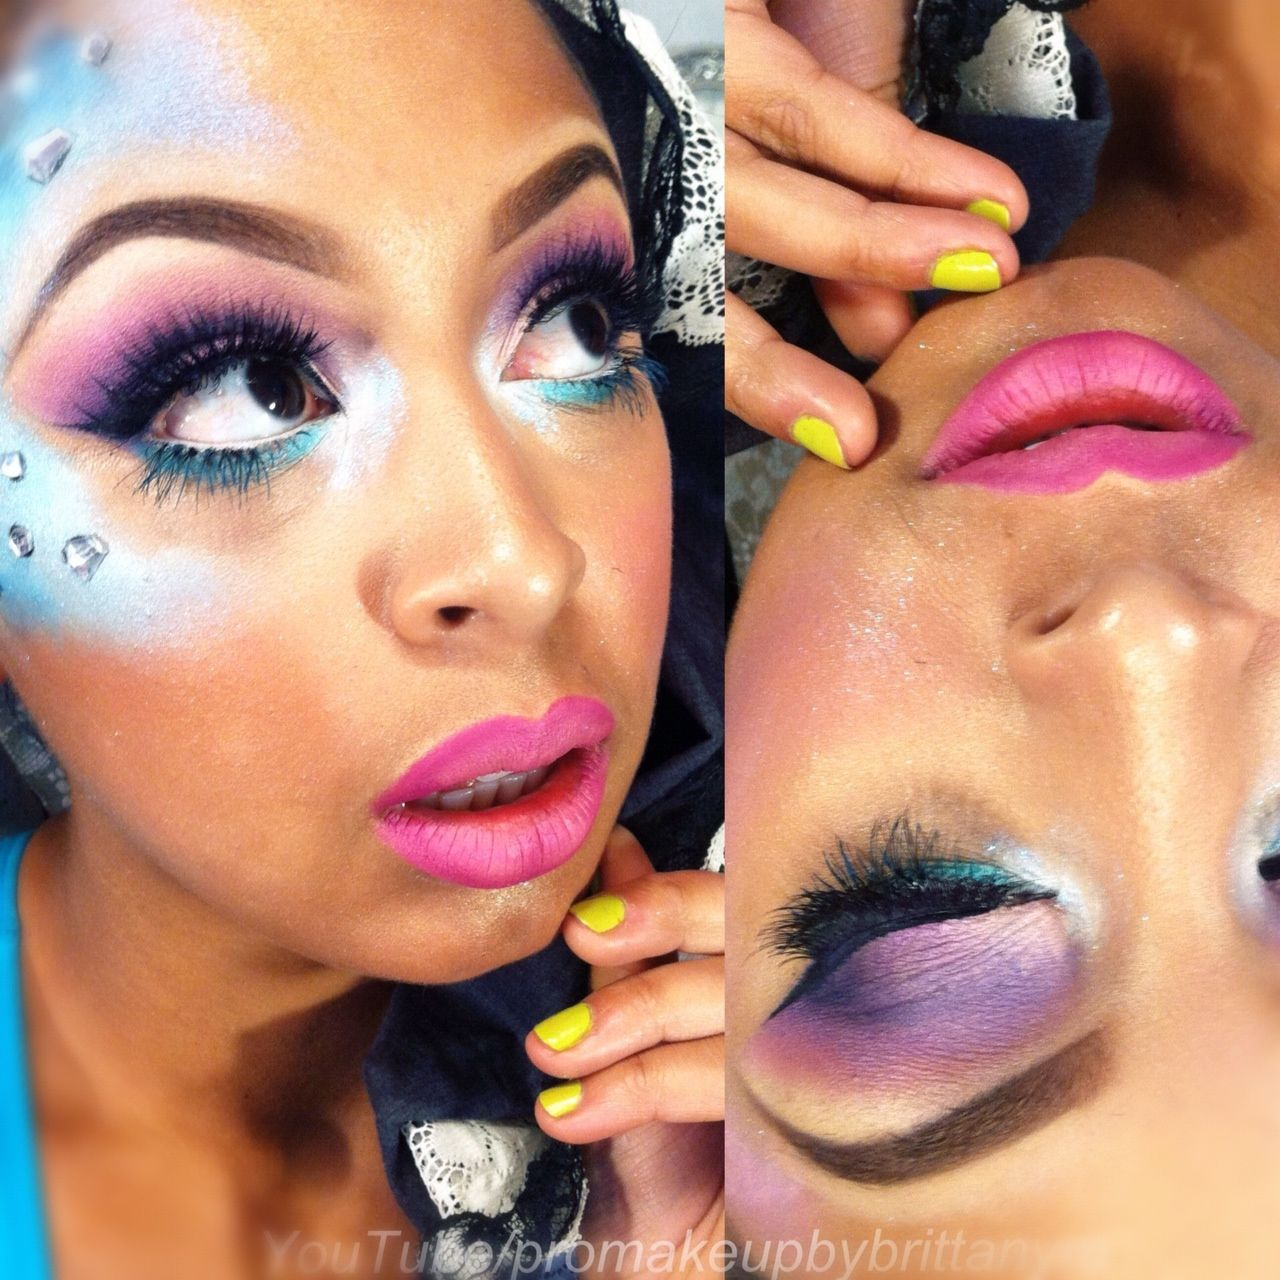 Mermaid Makeup Inspiration   Instagram.com/makeupbybrittanym